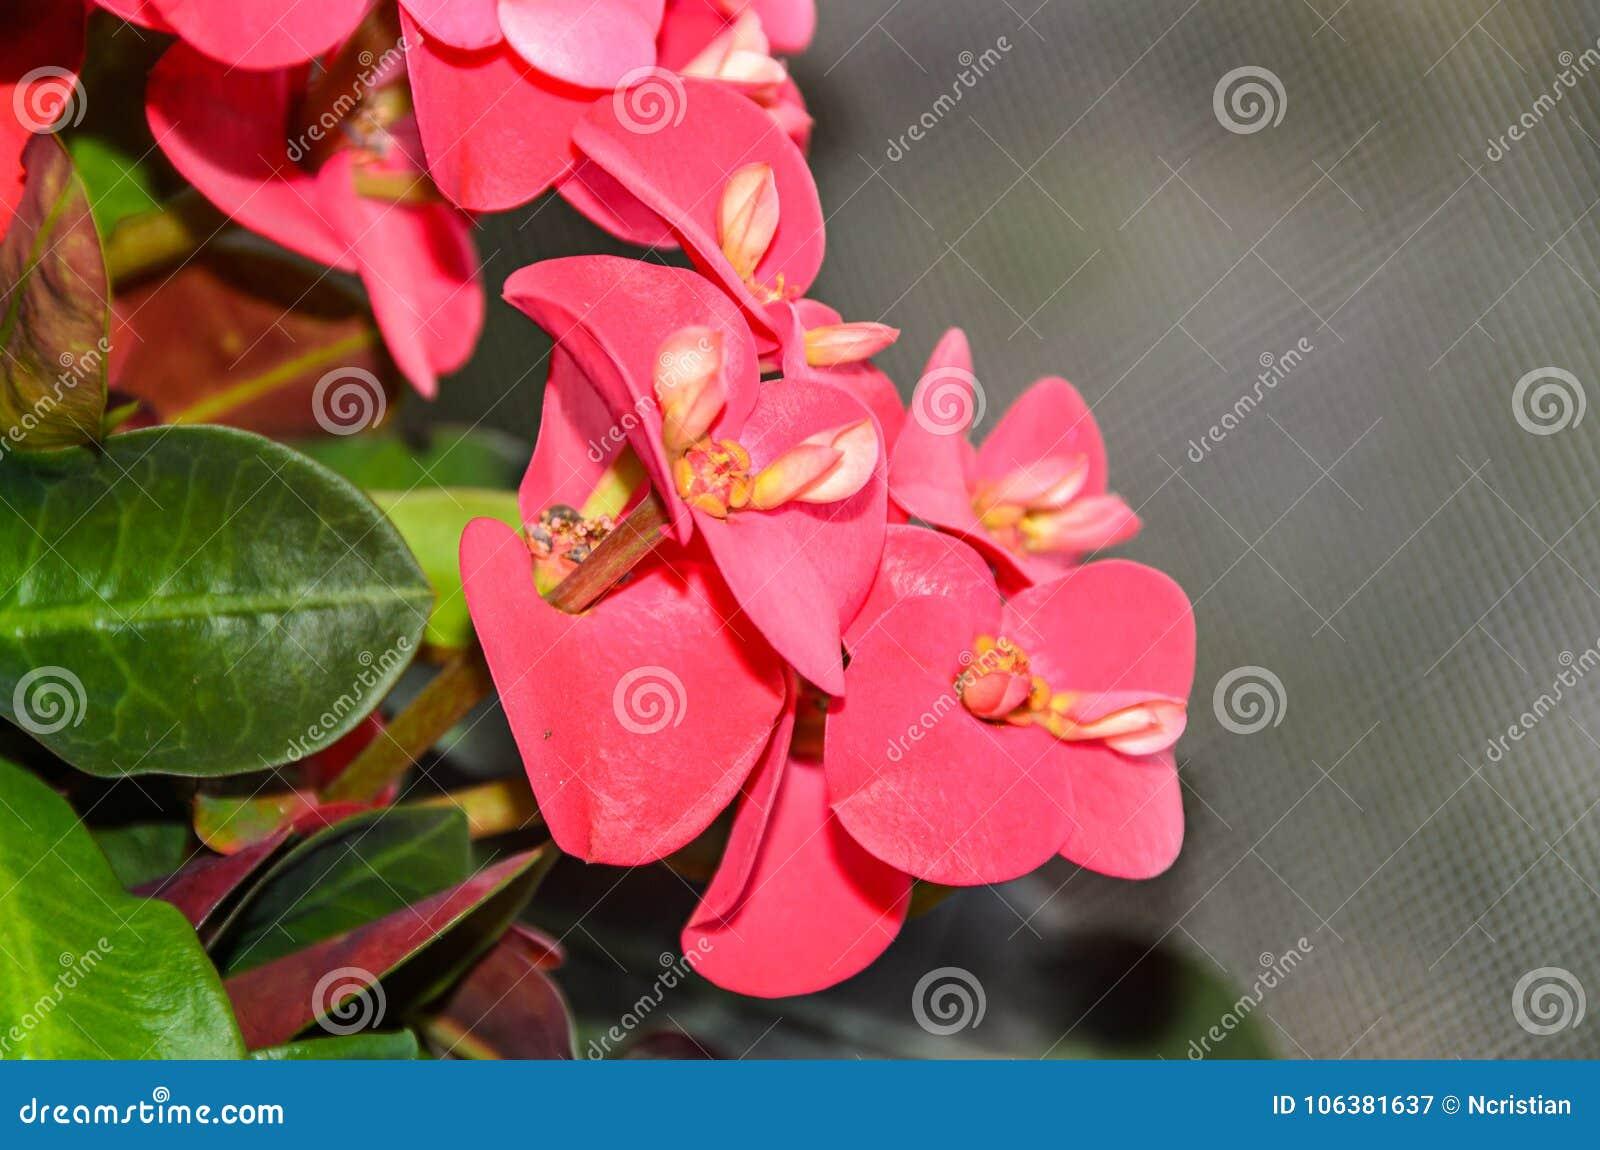 Euphorbia pink red flowers crown of thorns christ plant coronita download euphorbia pink red flowers crown of thorns christ plant coronita lui iisus stock izmirmasajfo